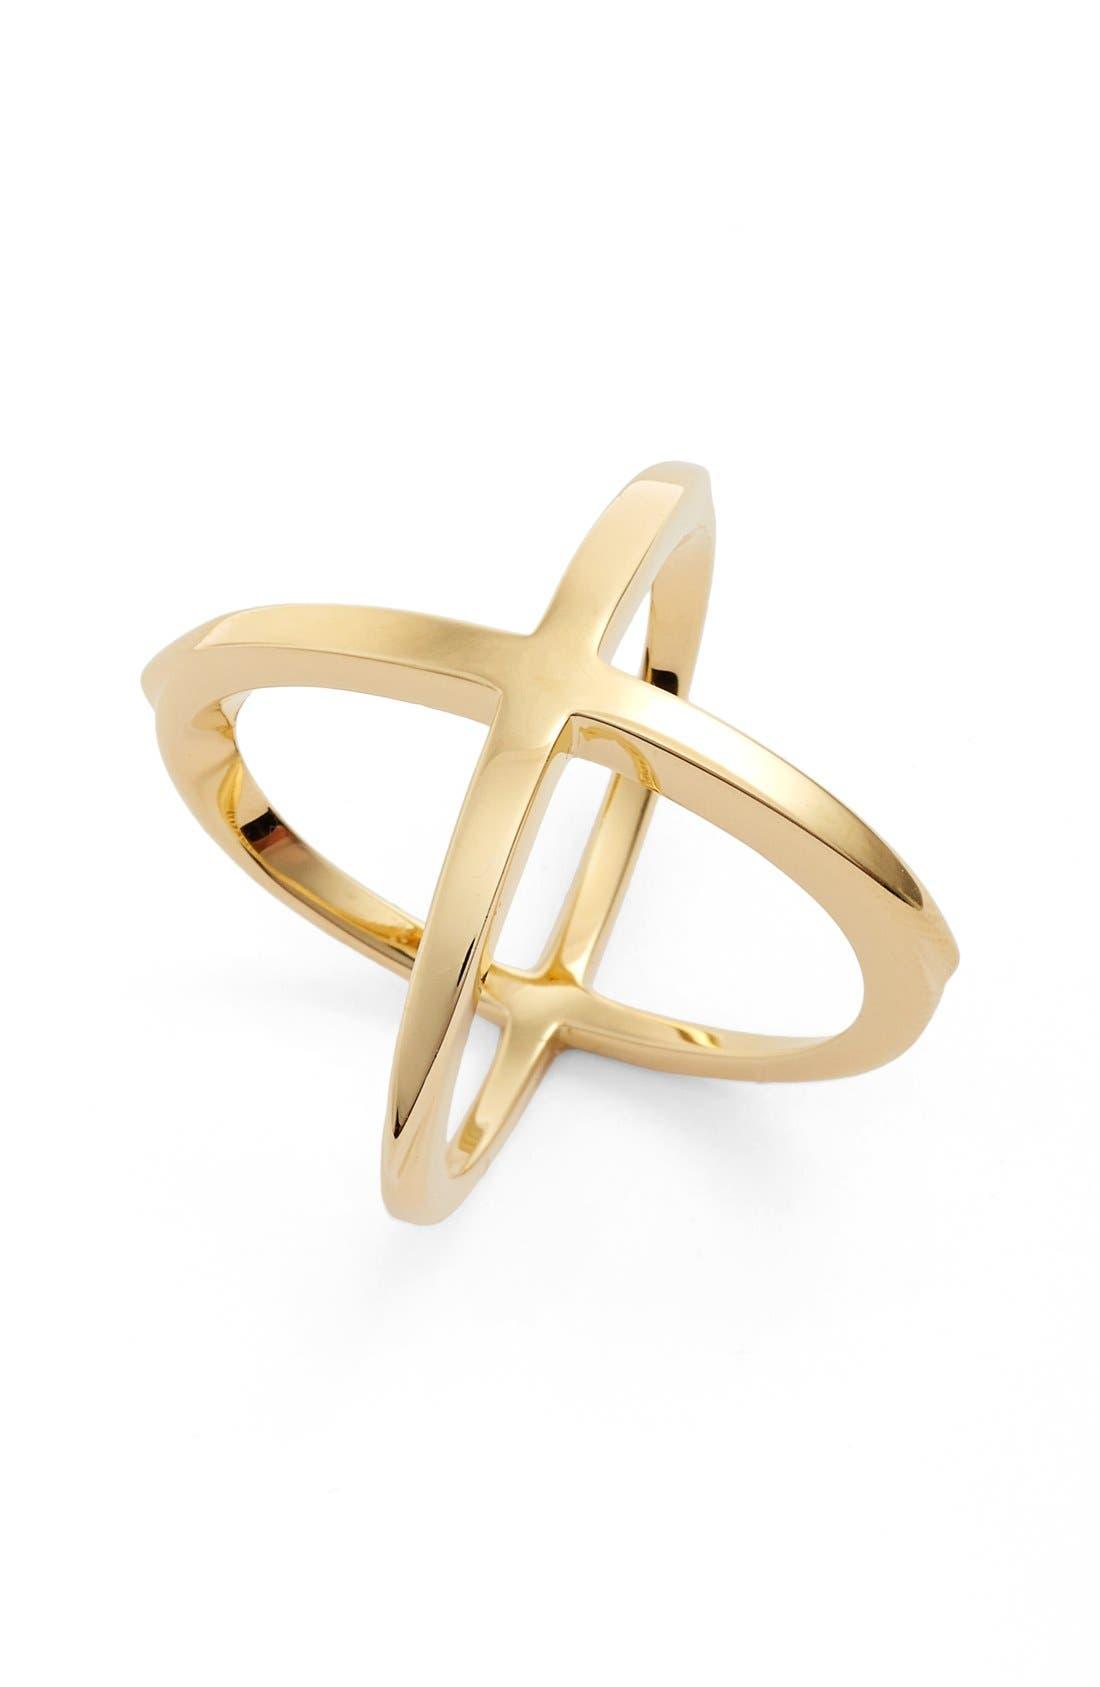 Elizabeth and James 'Windrose' Ring